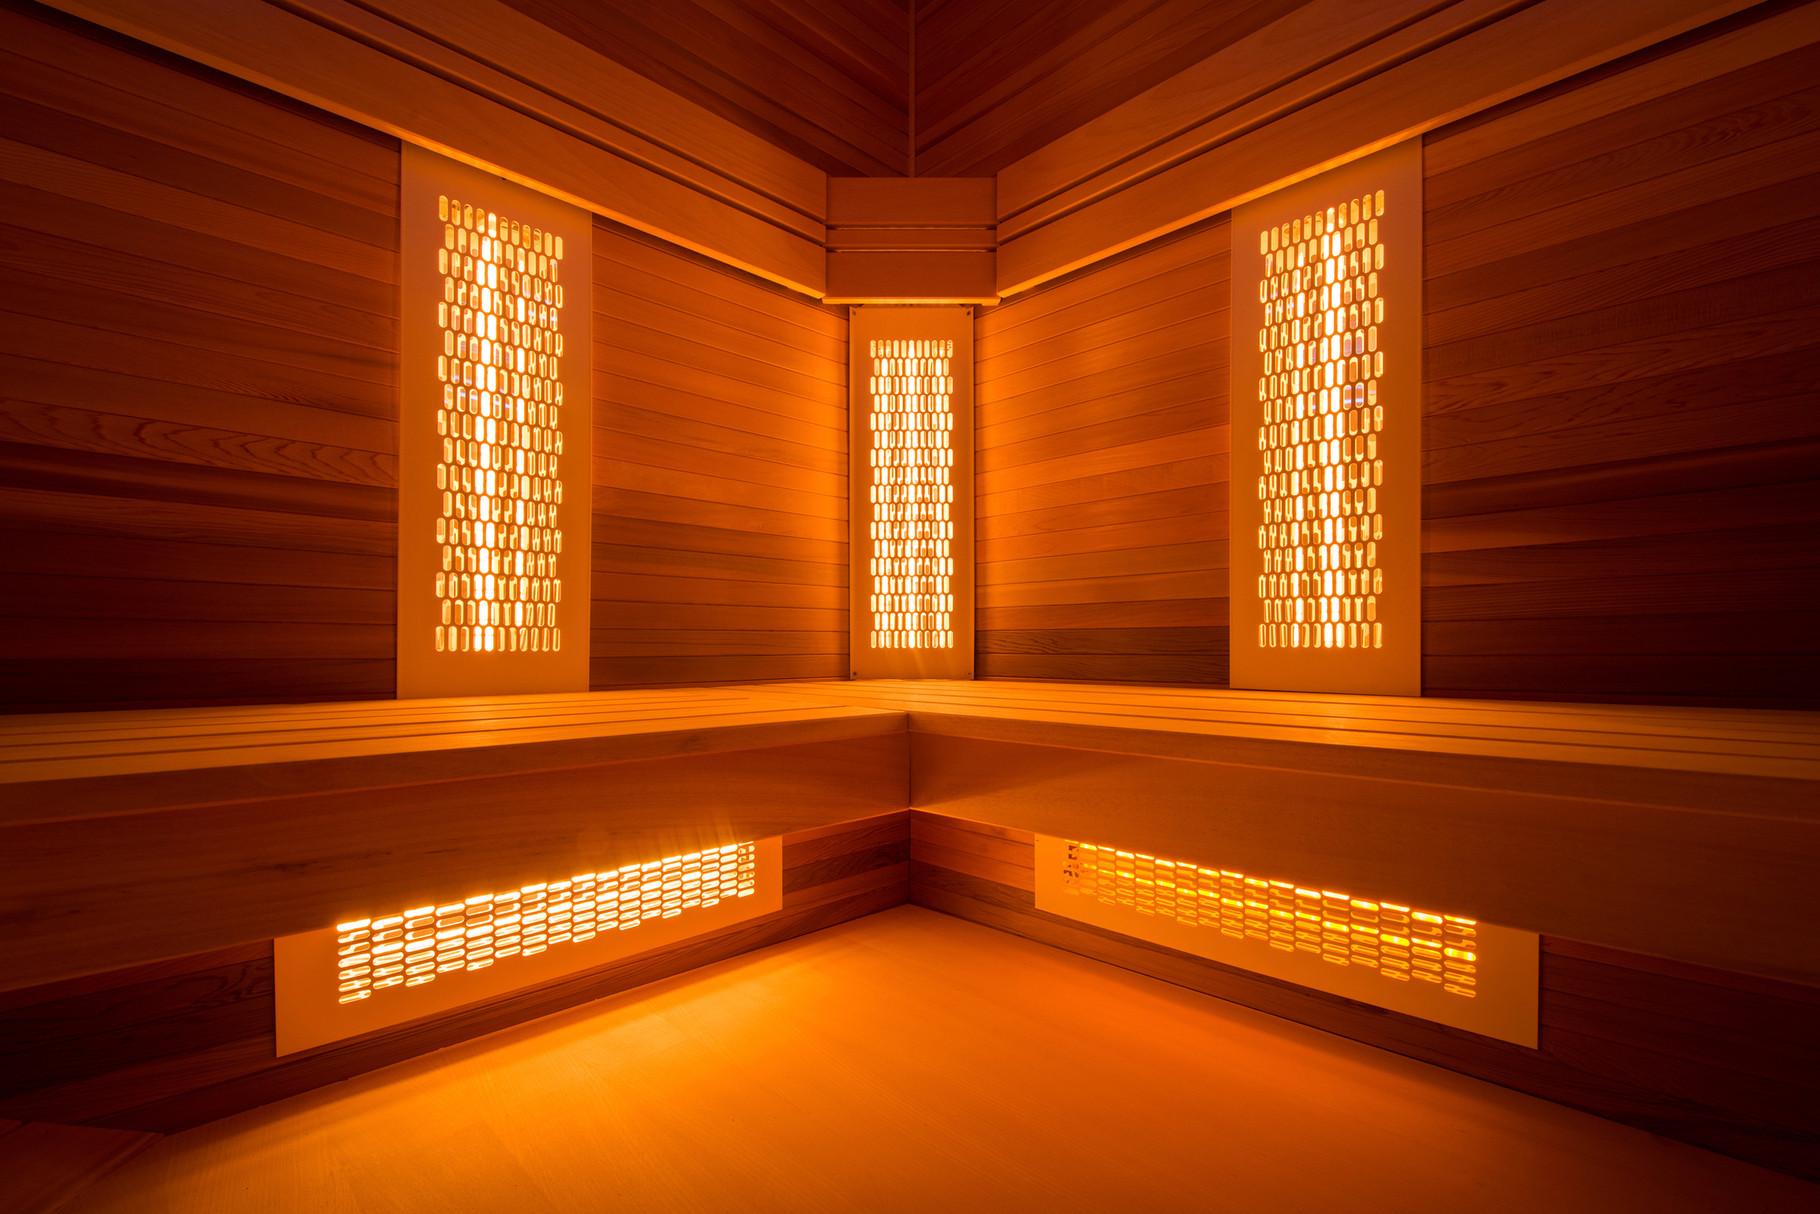 vente installation sauna cabine infrarouge maboutiquespas fabrication vente installation. Black Bedroom Furniture Sets. Home Design Ideas